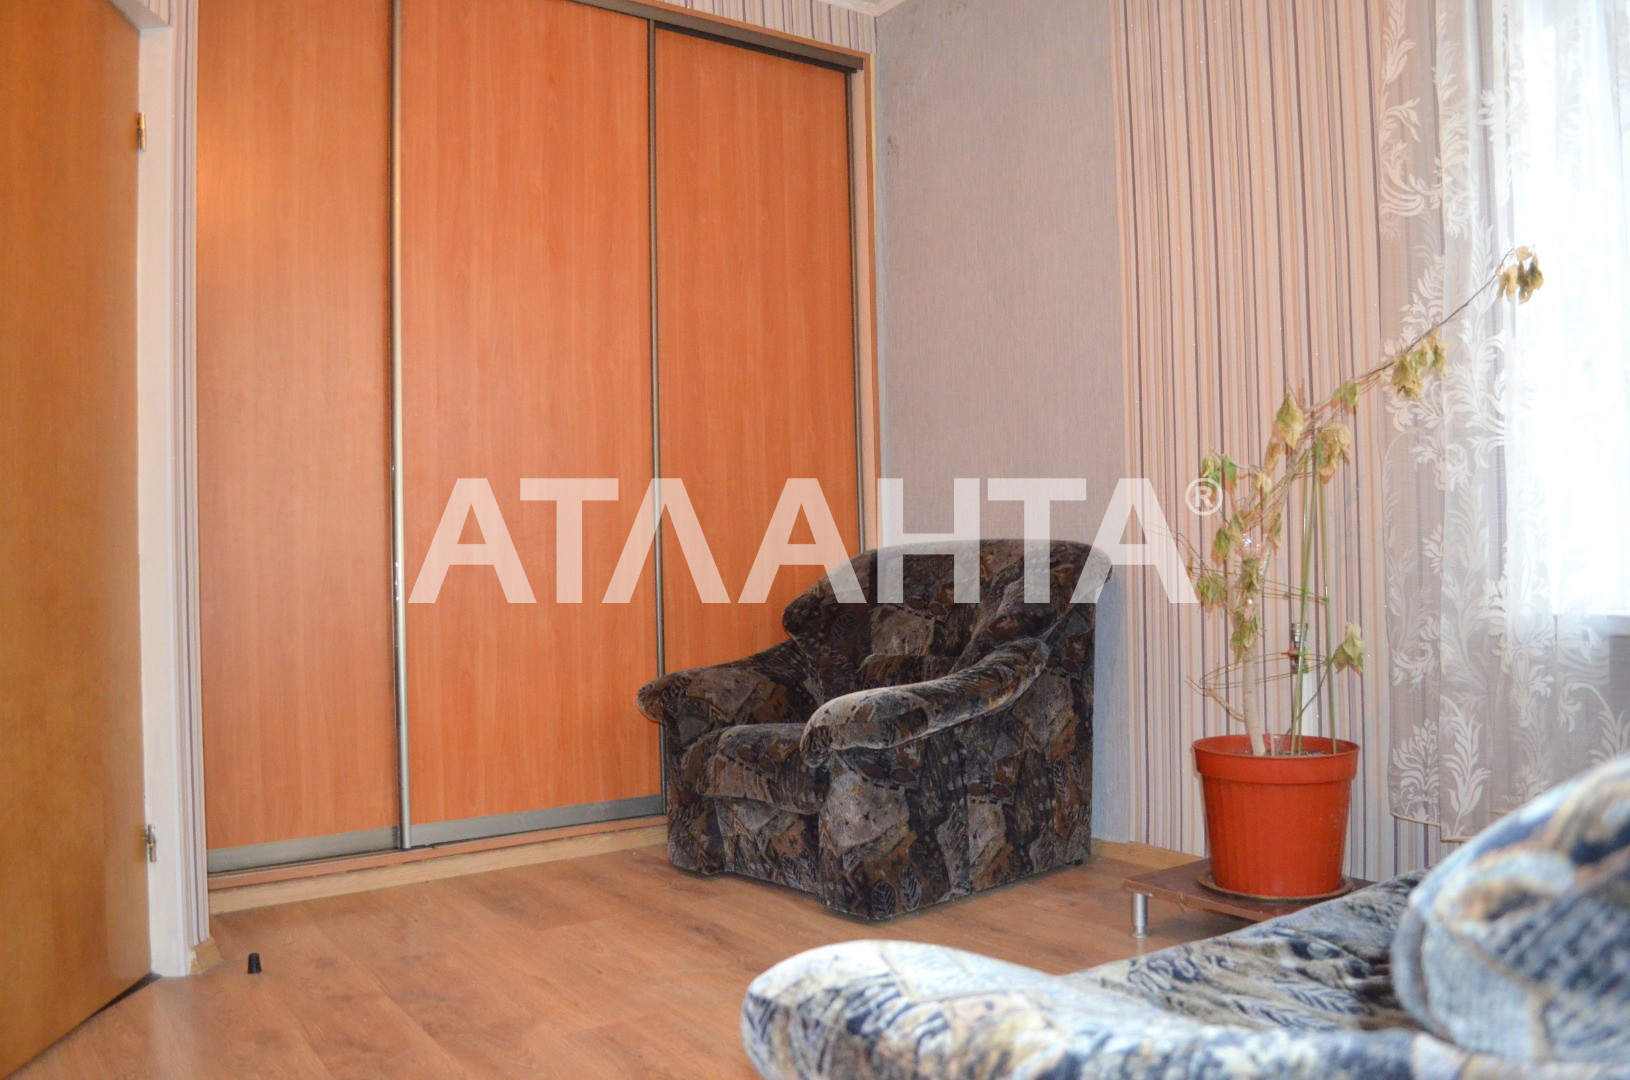 Продается 3-комнатная Квартира на ул. Французский Бул. (Пролетарский Бул.) — 98 000 у.е. (фото №6)